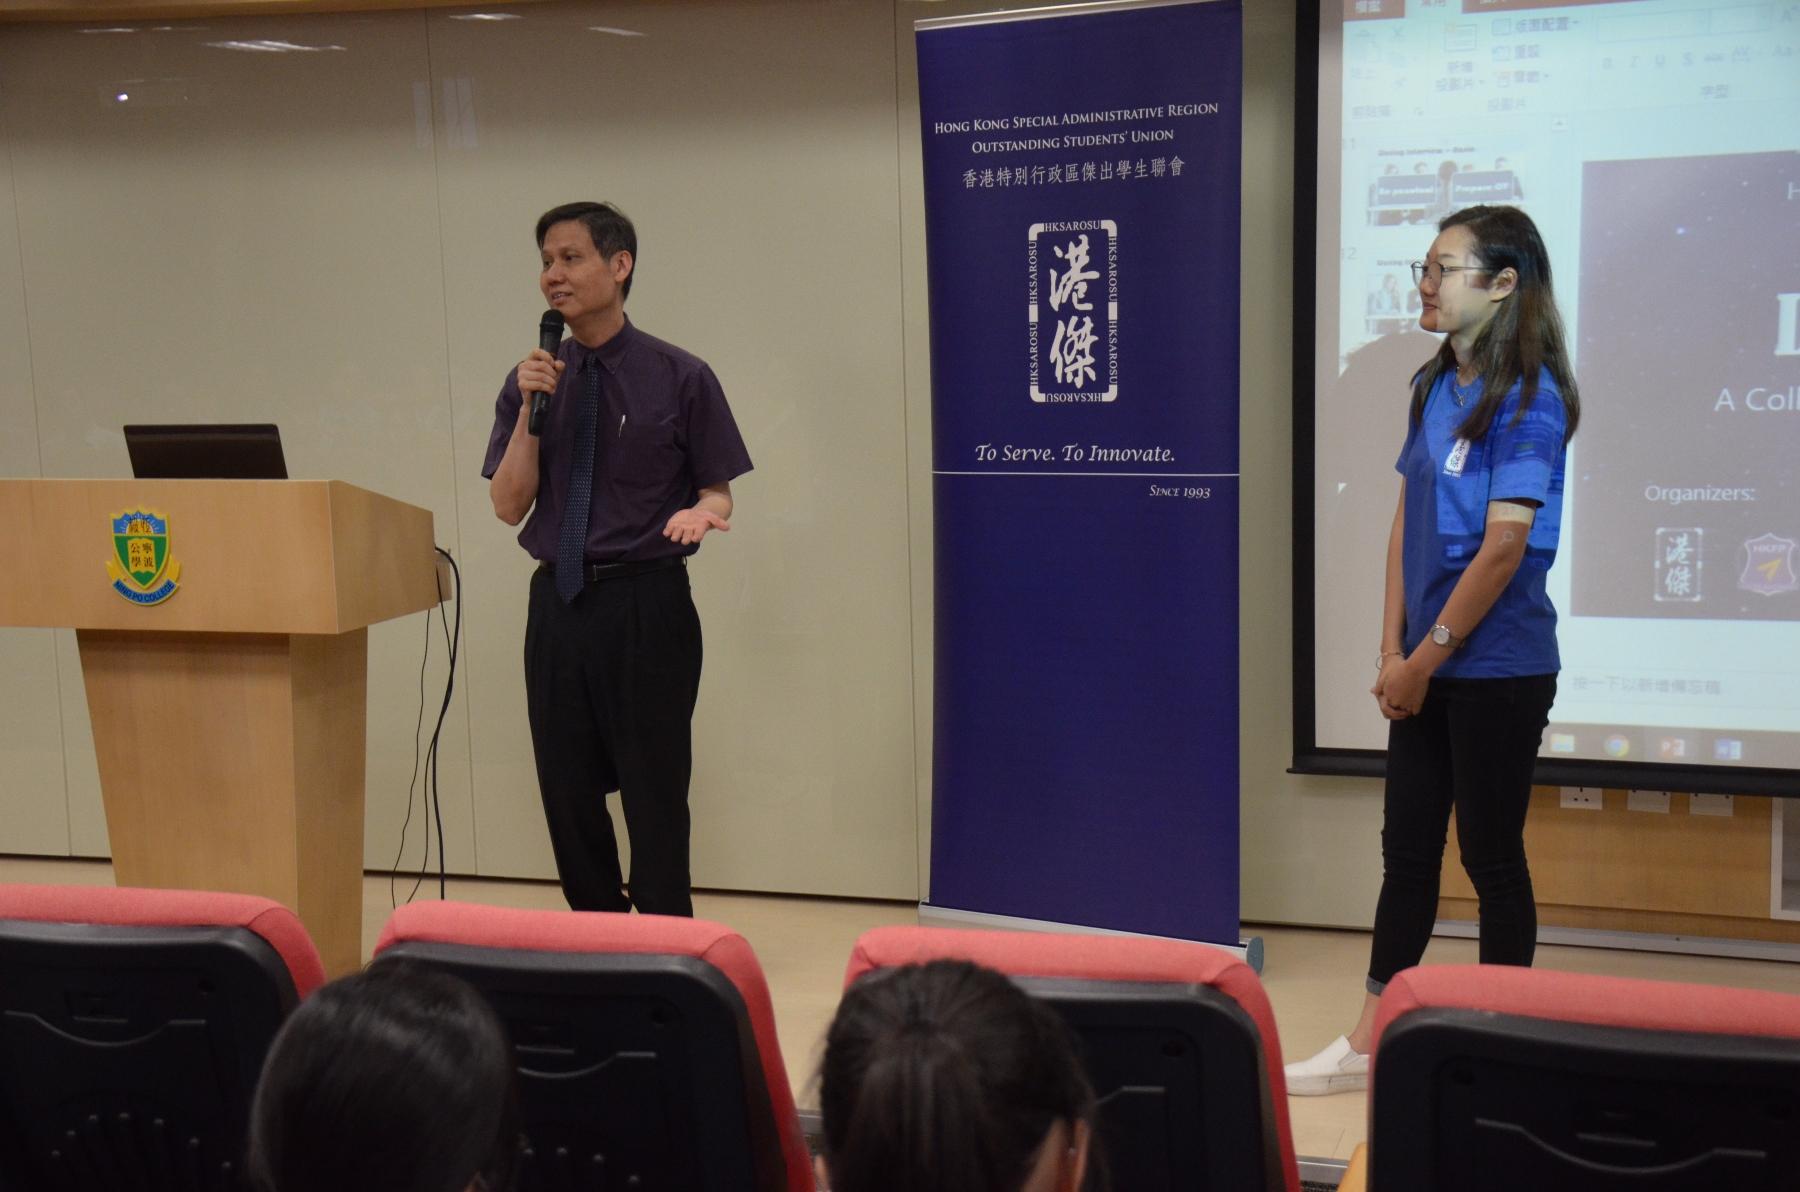 http://npc.edu.hk/sites/default/files/dsc_2828.jpg